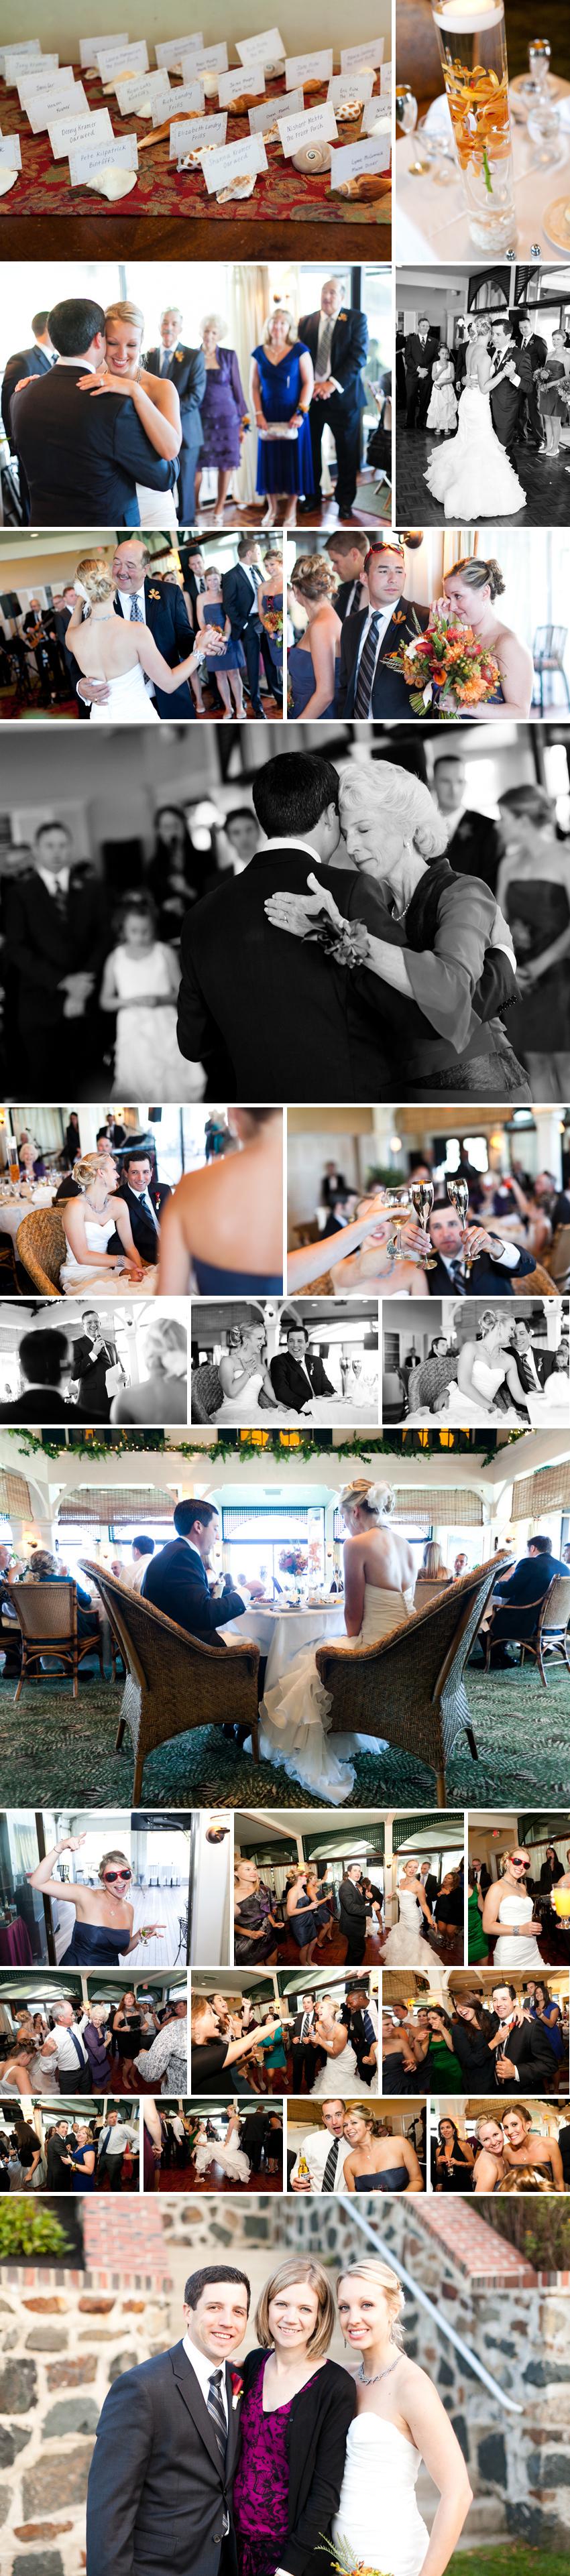 Maine wedding by Kansas City wedding photographer Darbi G.